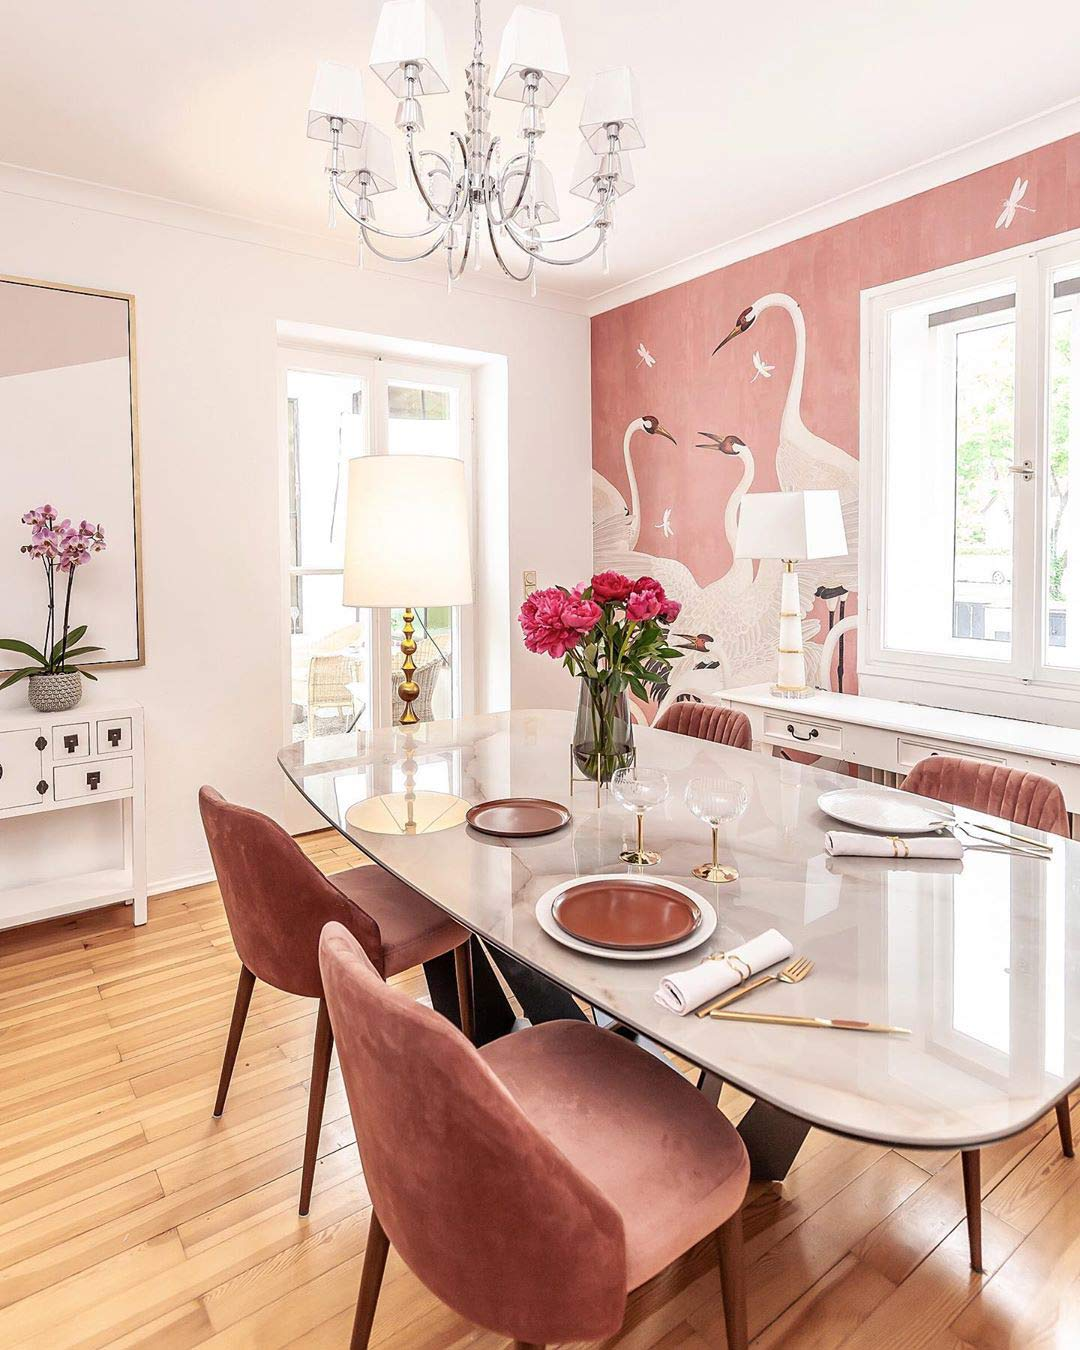 wallpaper-gucci-heron-diningroom-pink